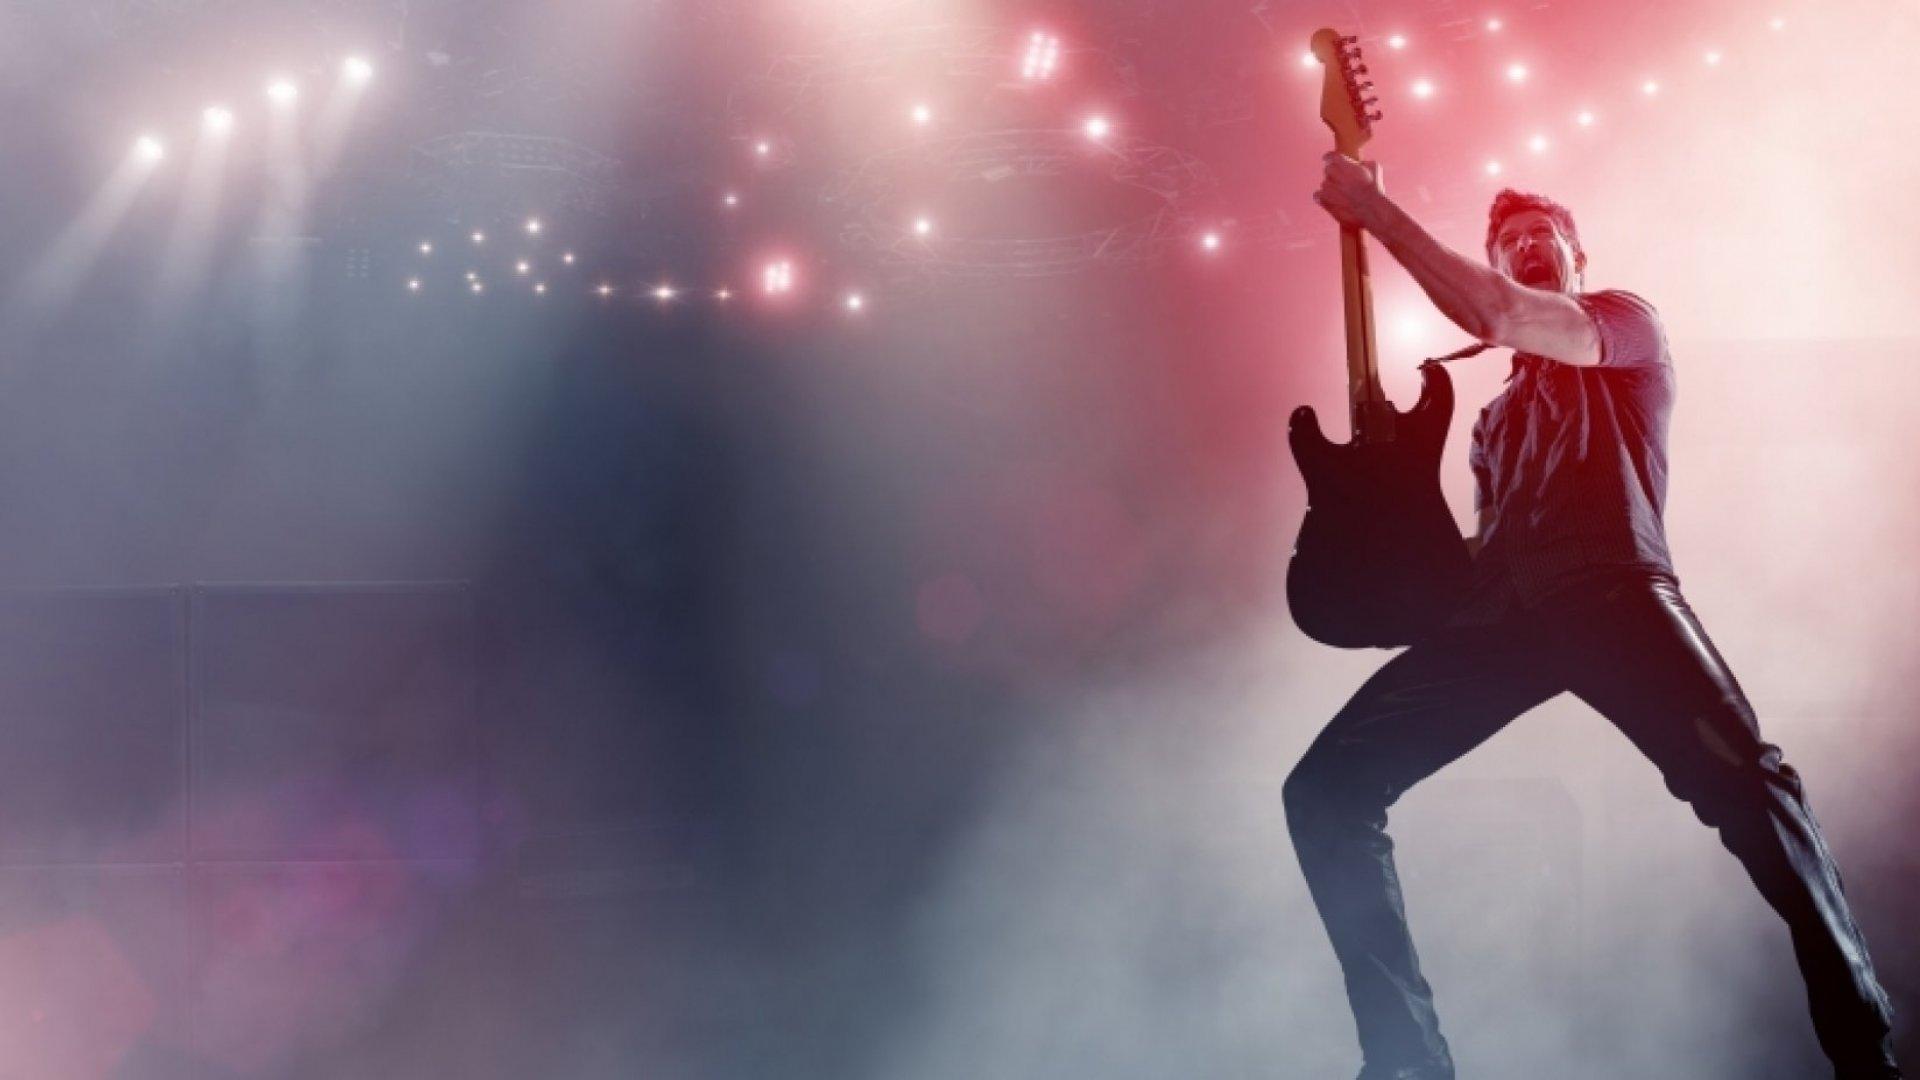 Guns N' Roses Guitarist DJ Ashba on Being a Rock Star Entrepreneur